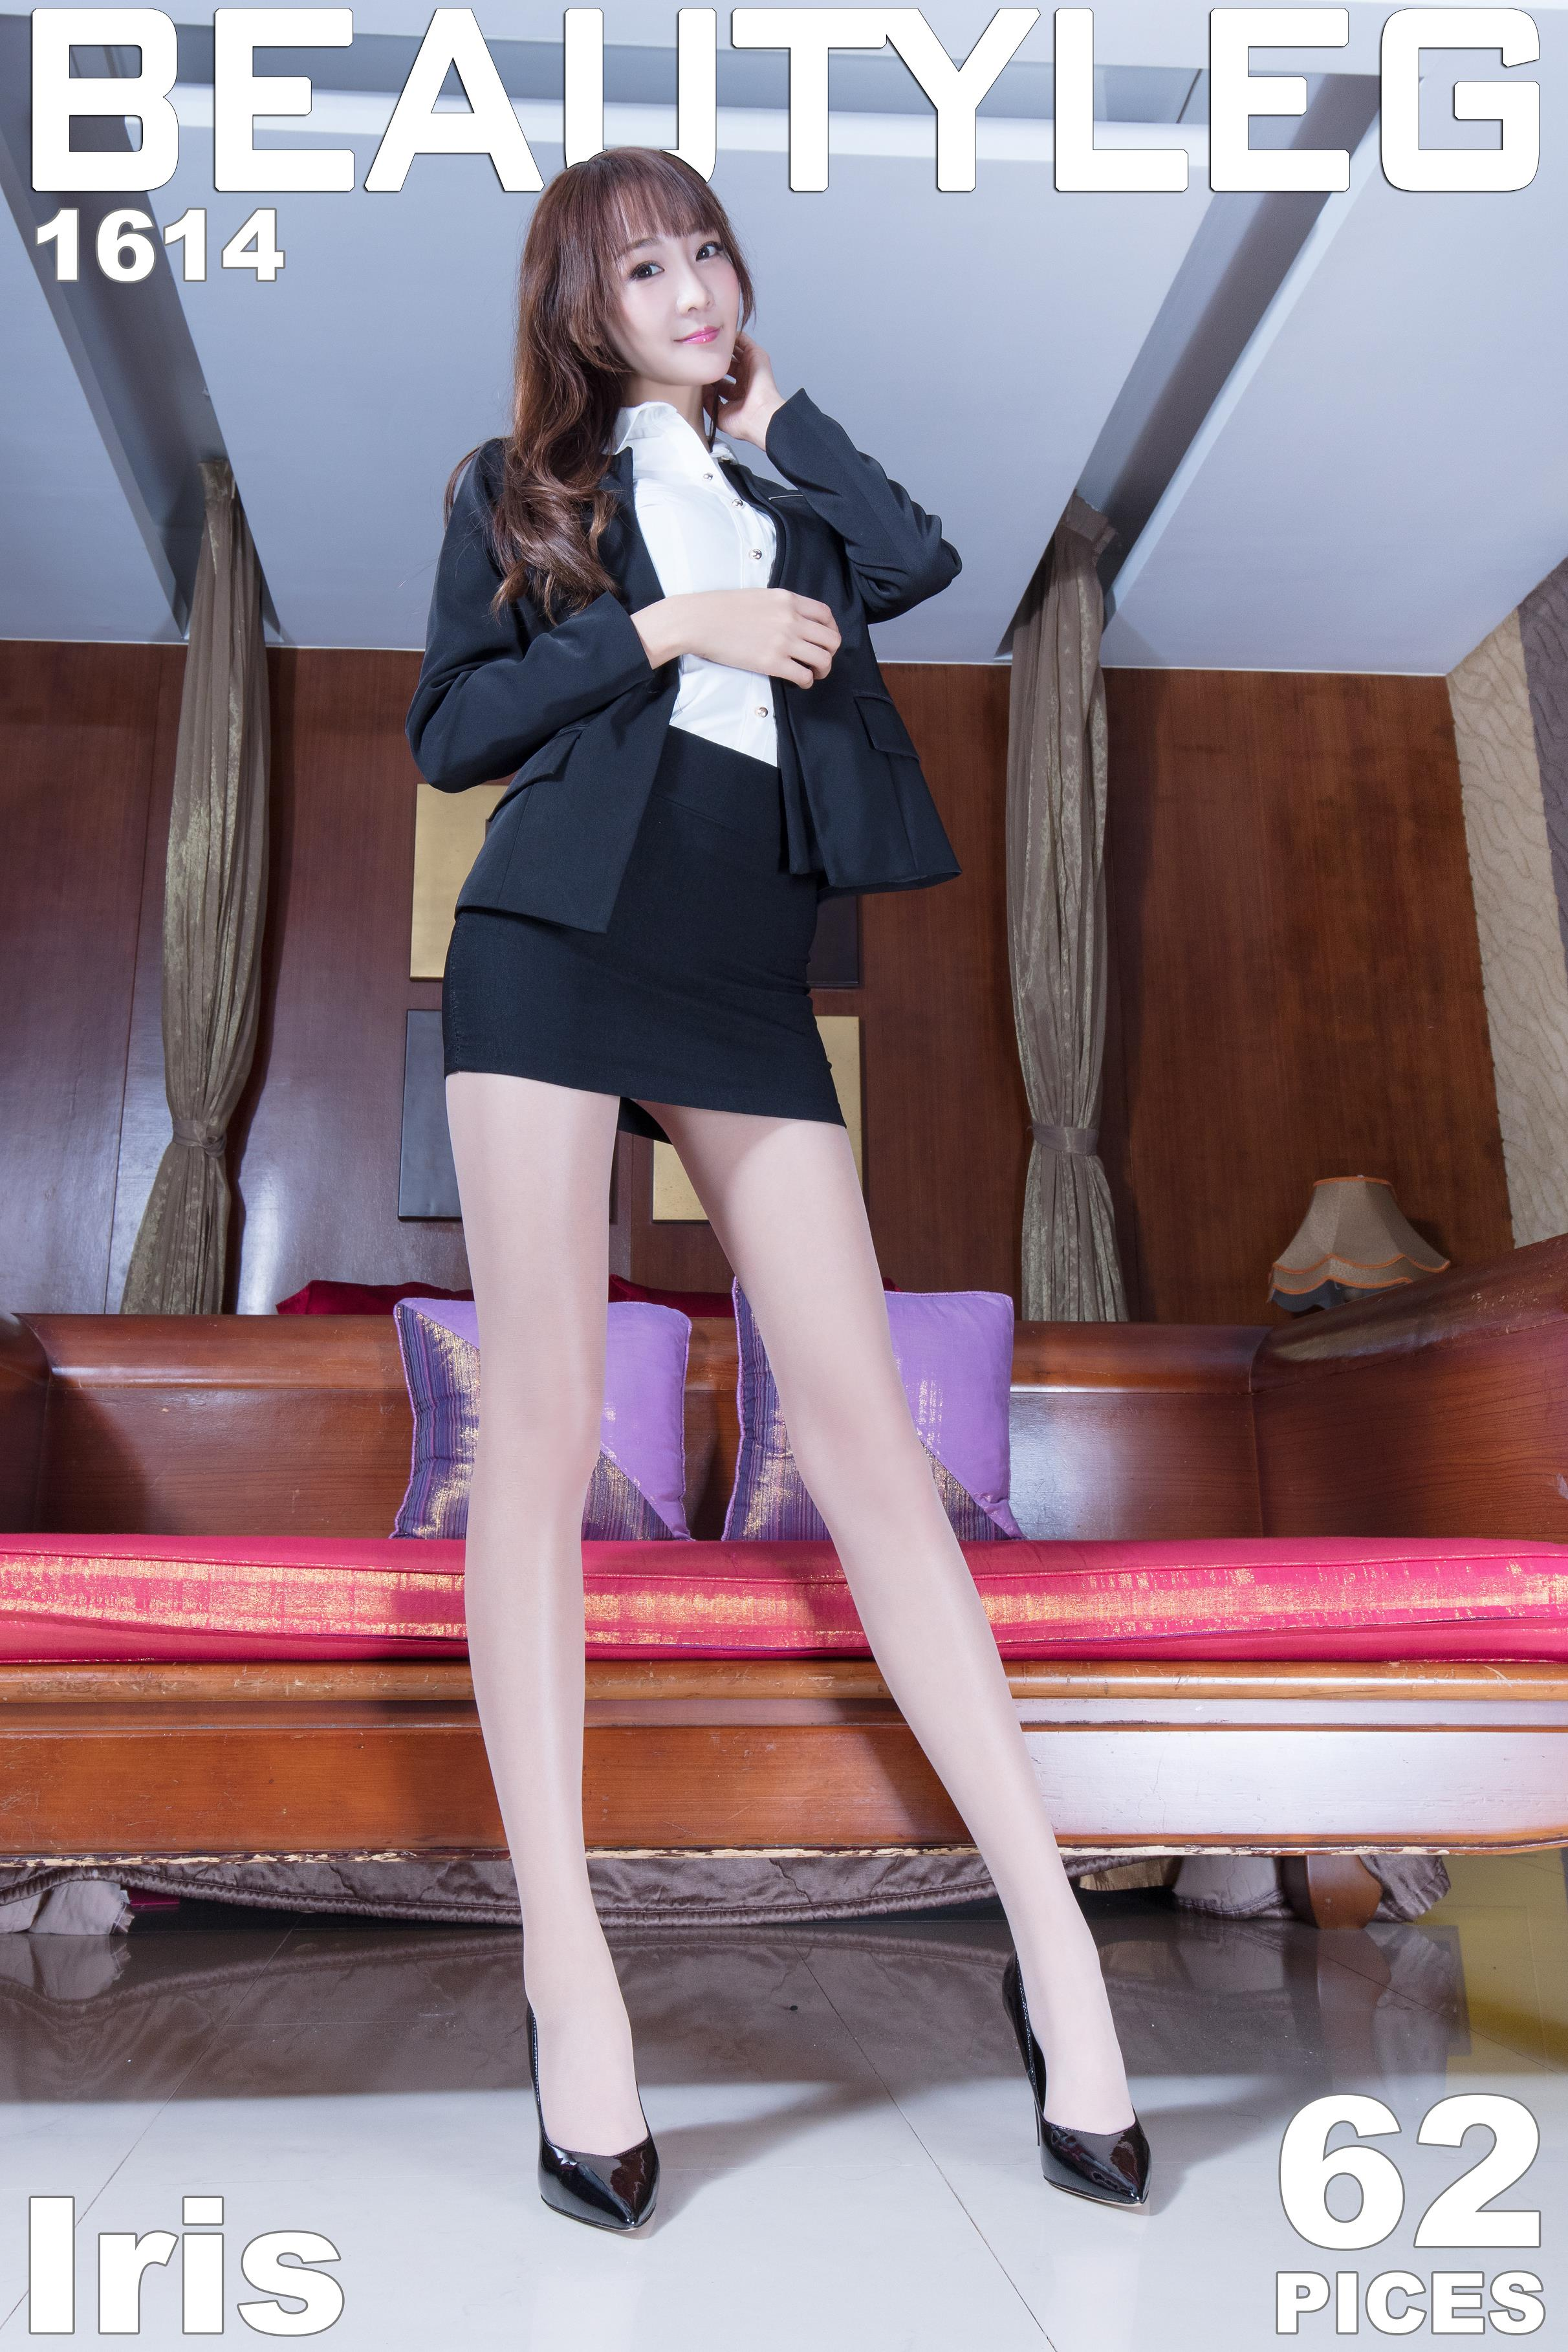 [beautyleg美腿写真]No.1614 性感女秘书 Iris 黑色OL制服与黑色包臀短裙加肉色丝袜美腿私房写真集